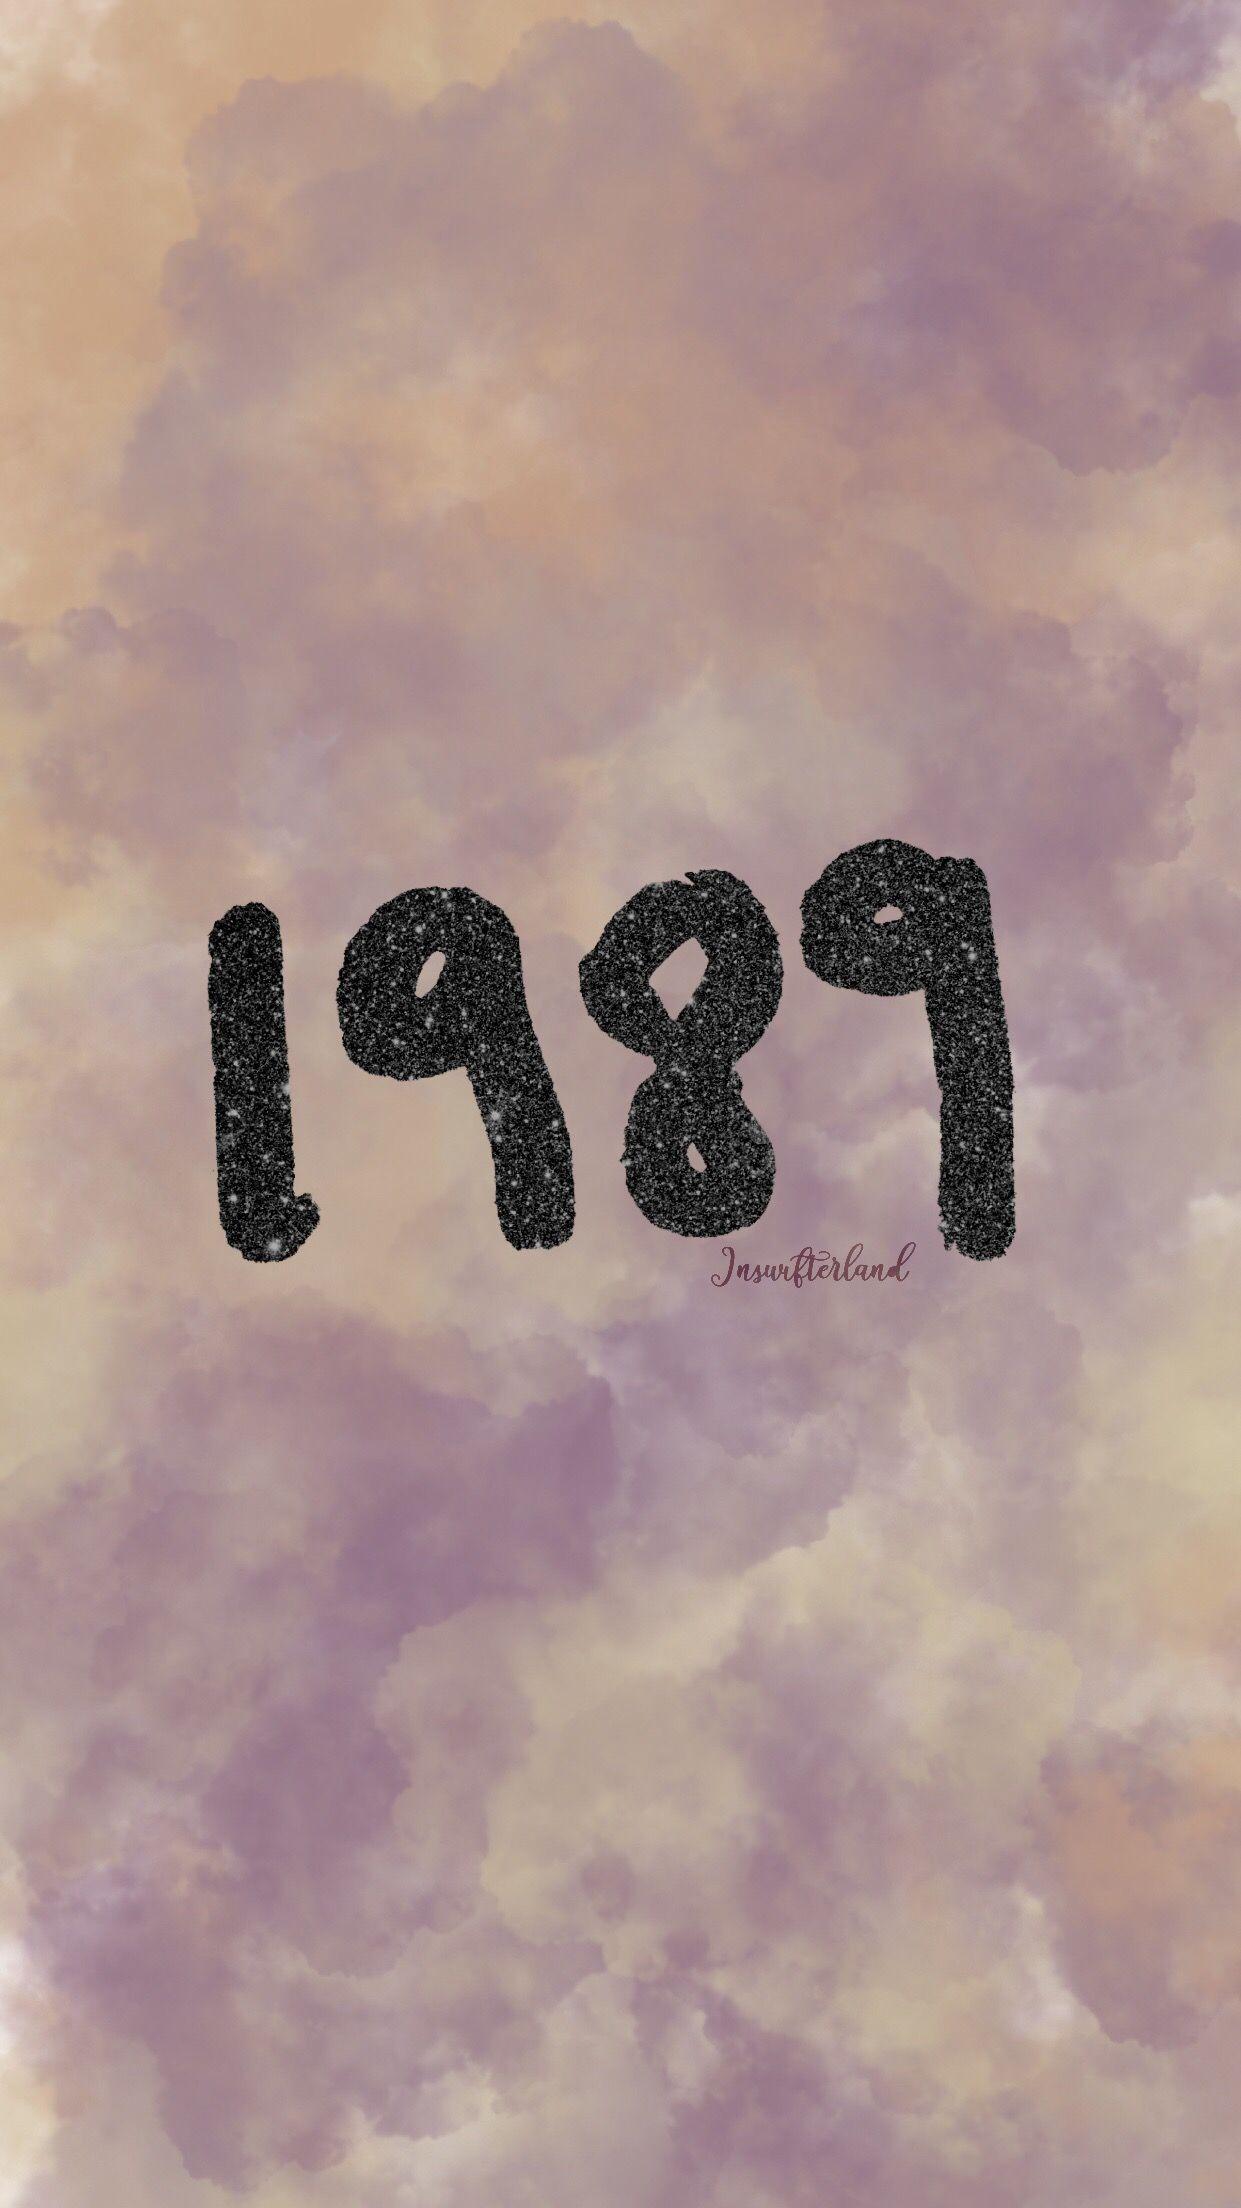 Taylor Swift Wallpaper In 2020 Taylor Swift Wallpaper Taylor Swift Album Taylor Swift